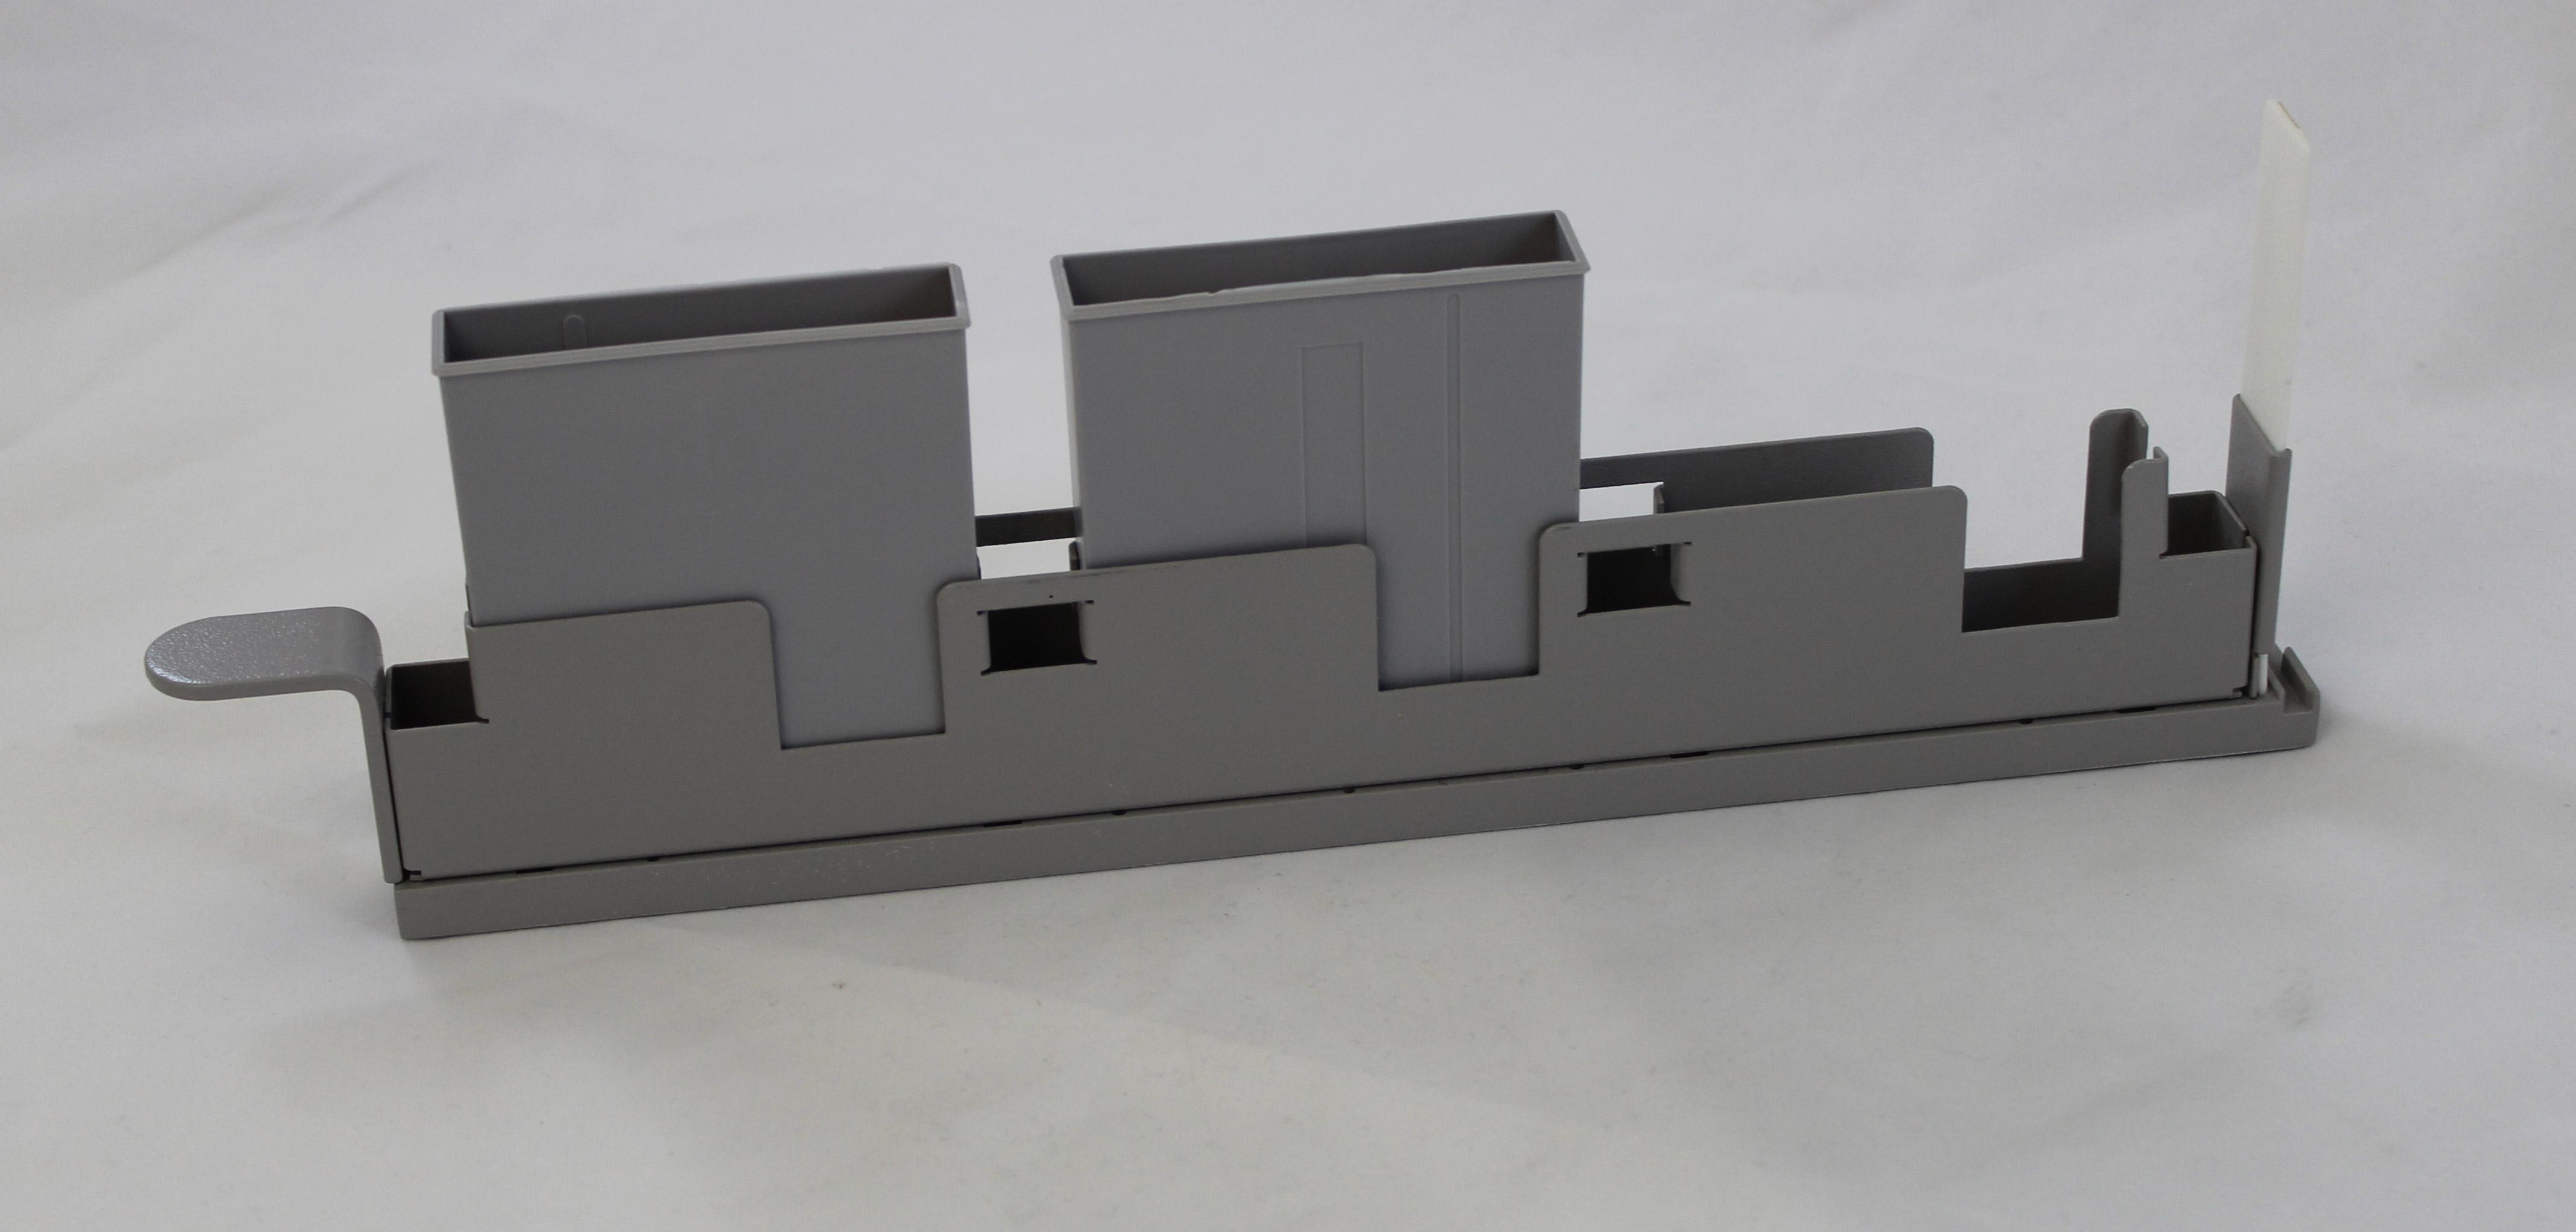 Tecan 3 position trough rack